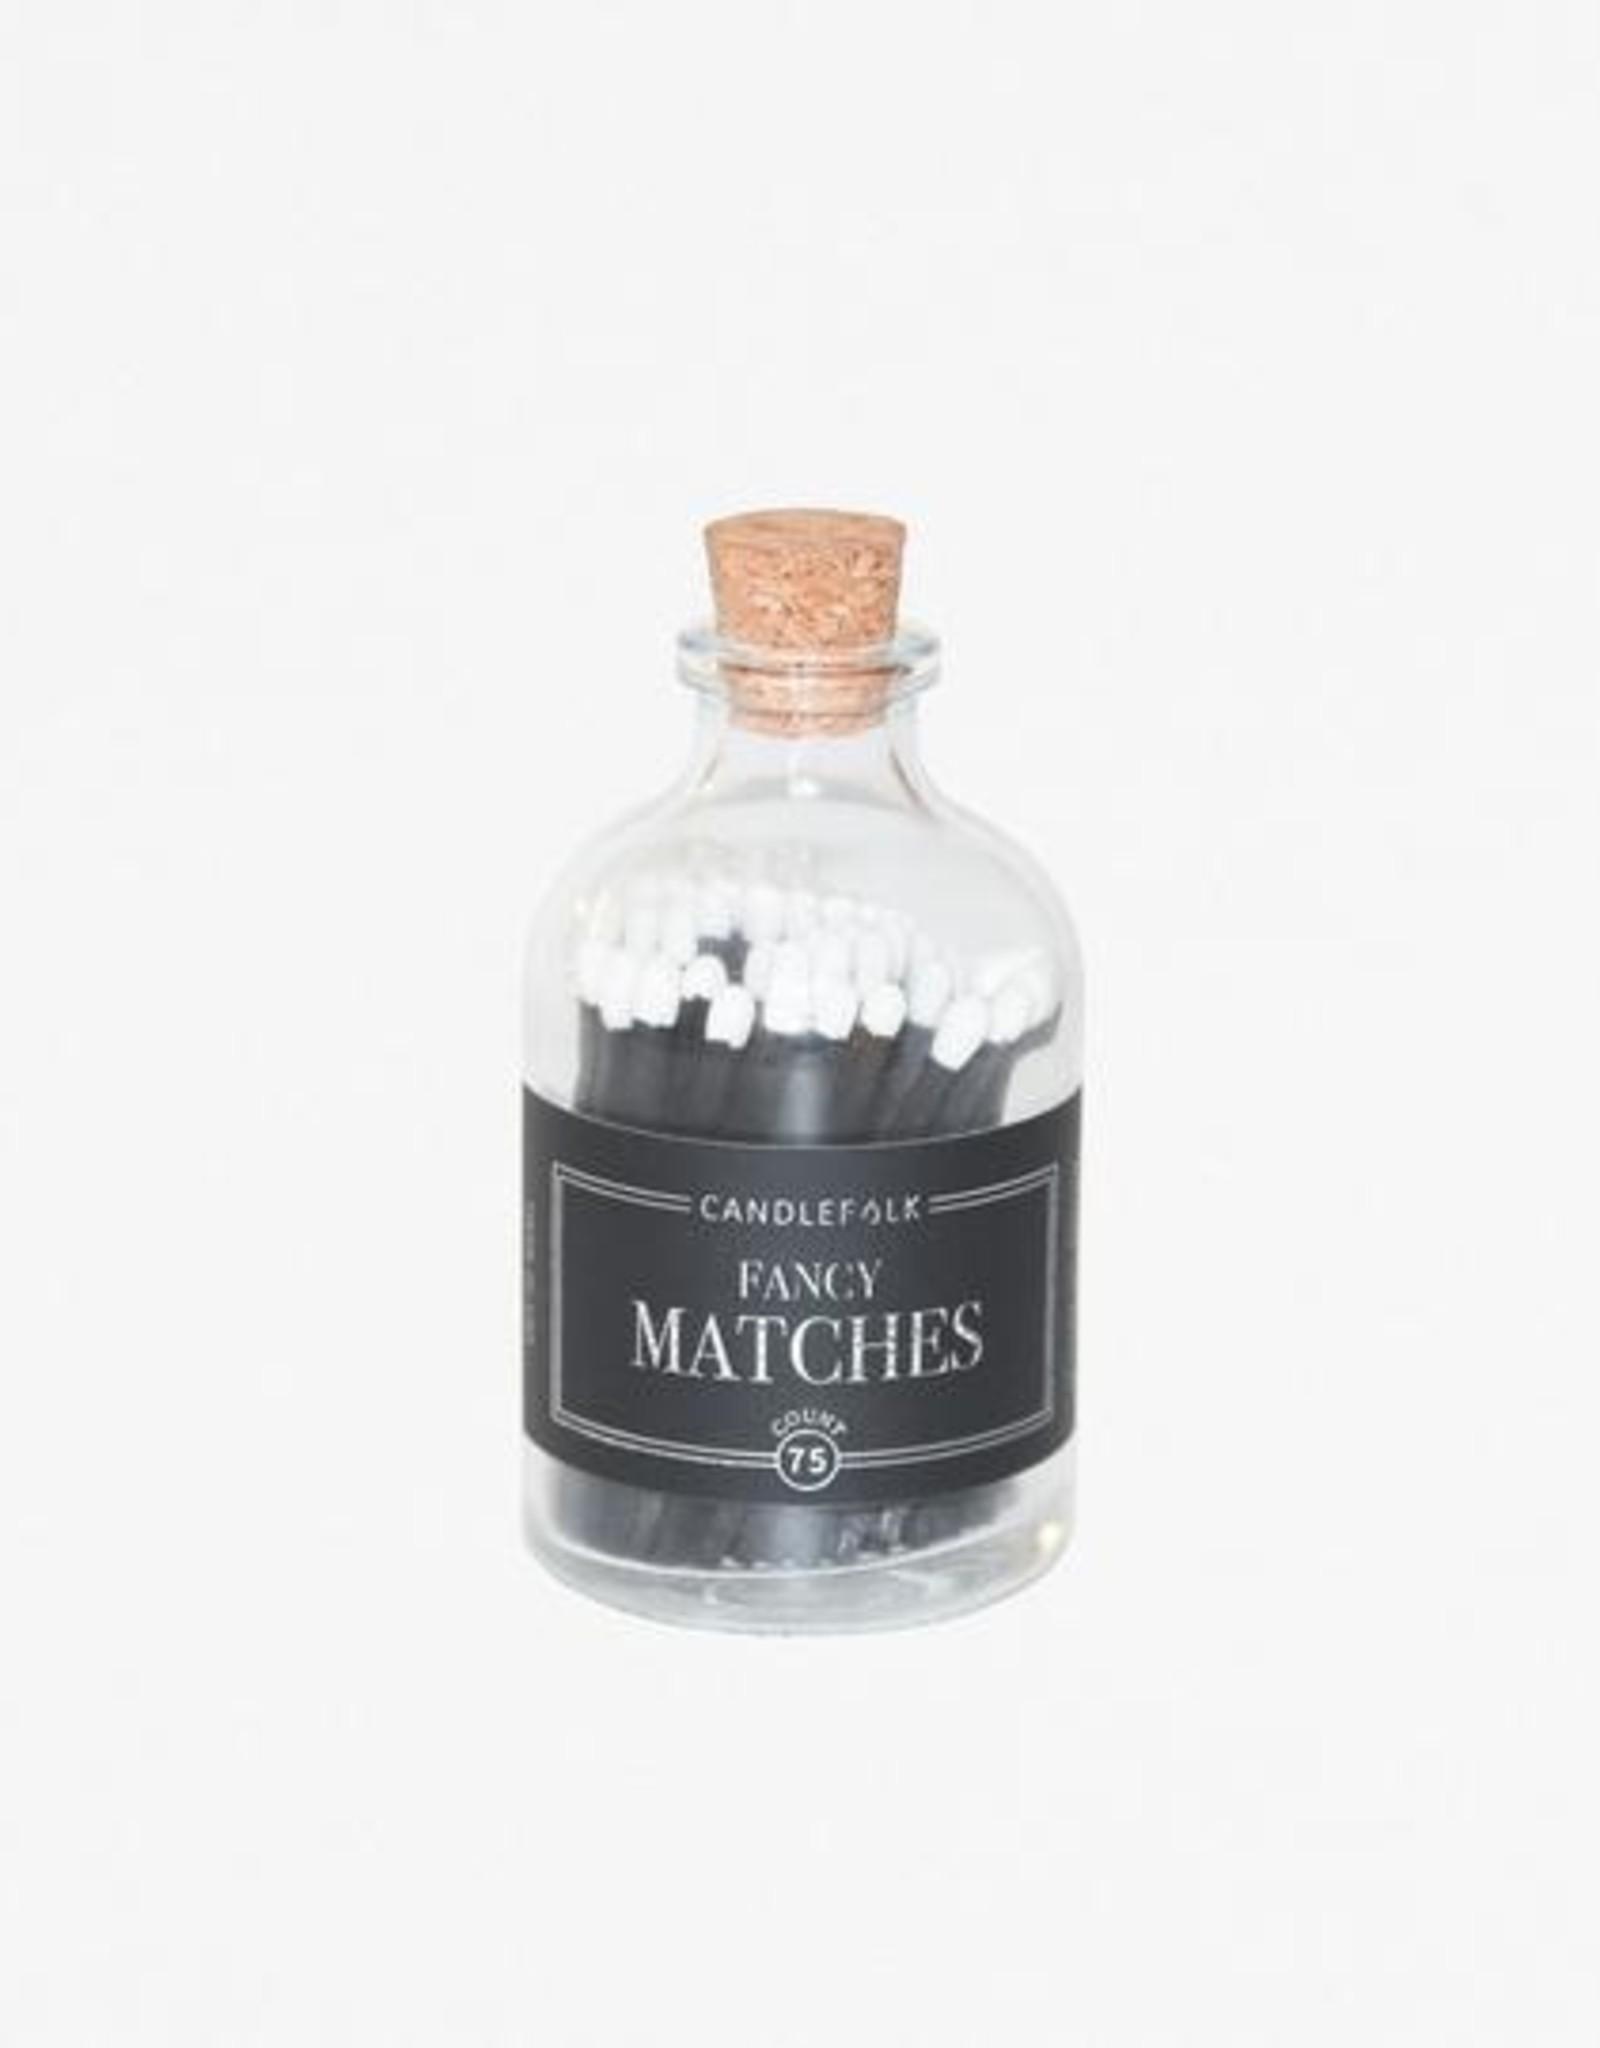 Candlefolk Apothecary Matches